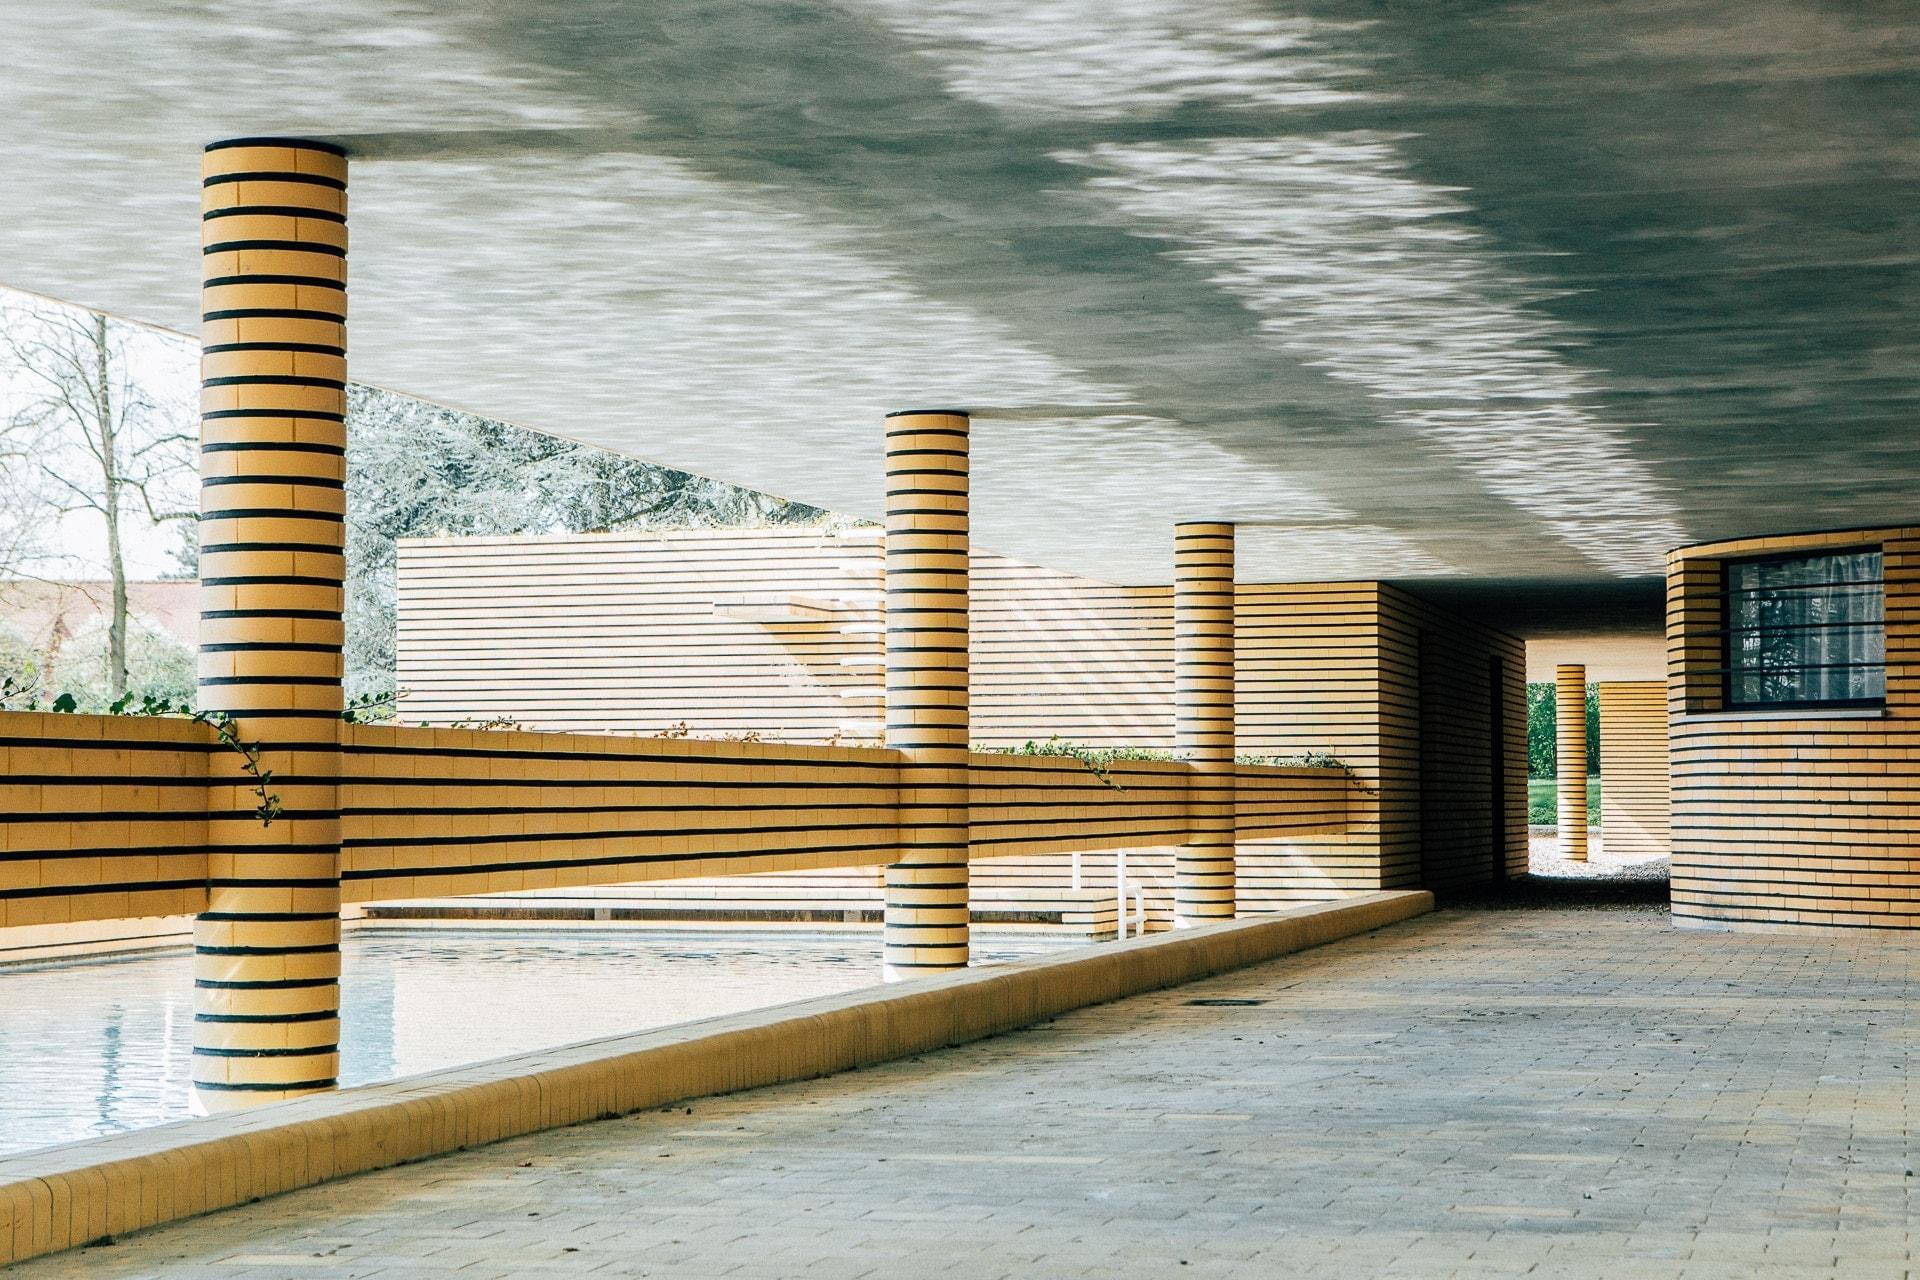 Reflets de la piscine - Villa Cavrois